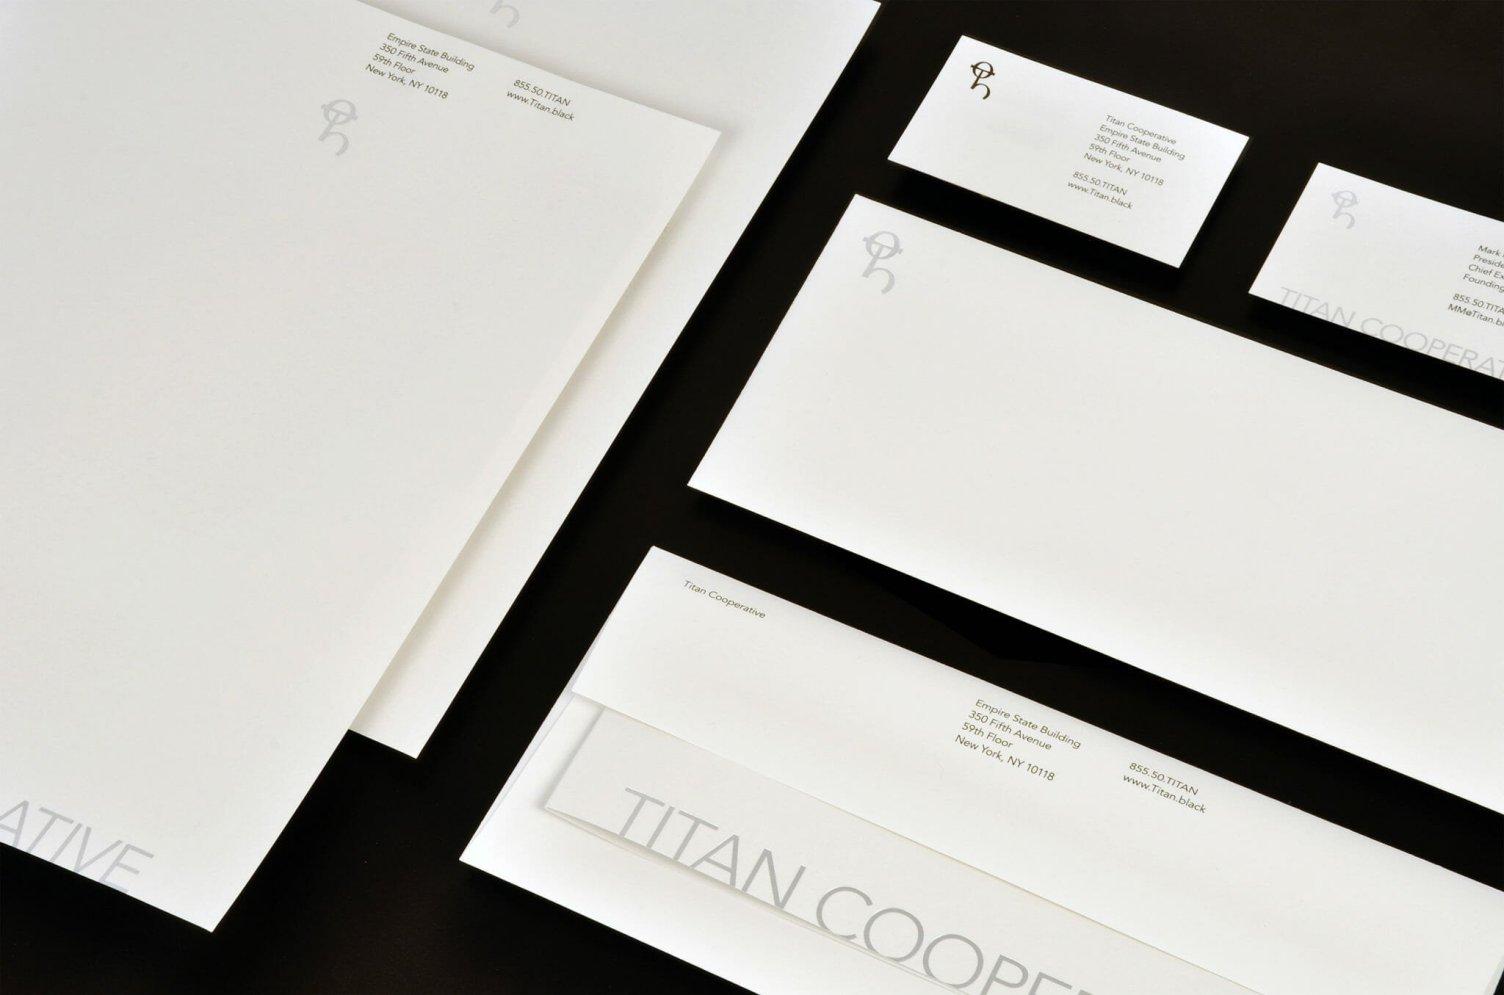 Titan Cooperative Stationery